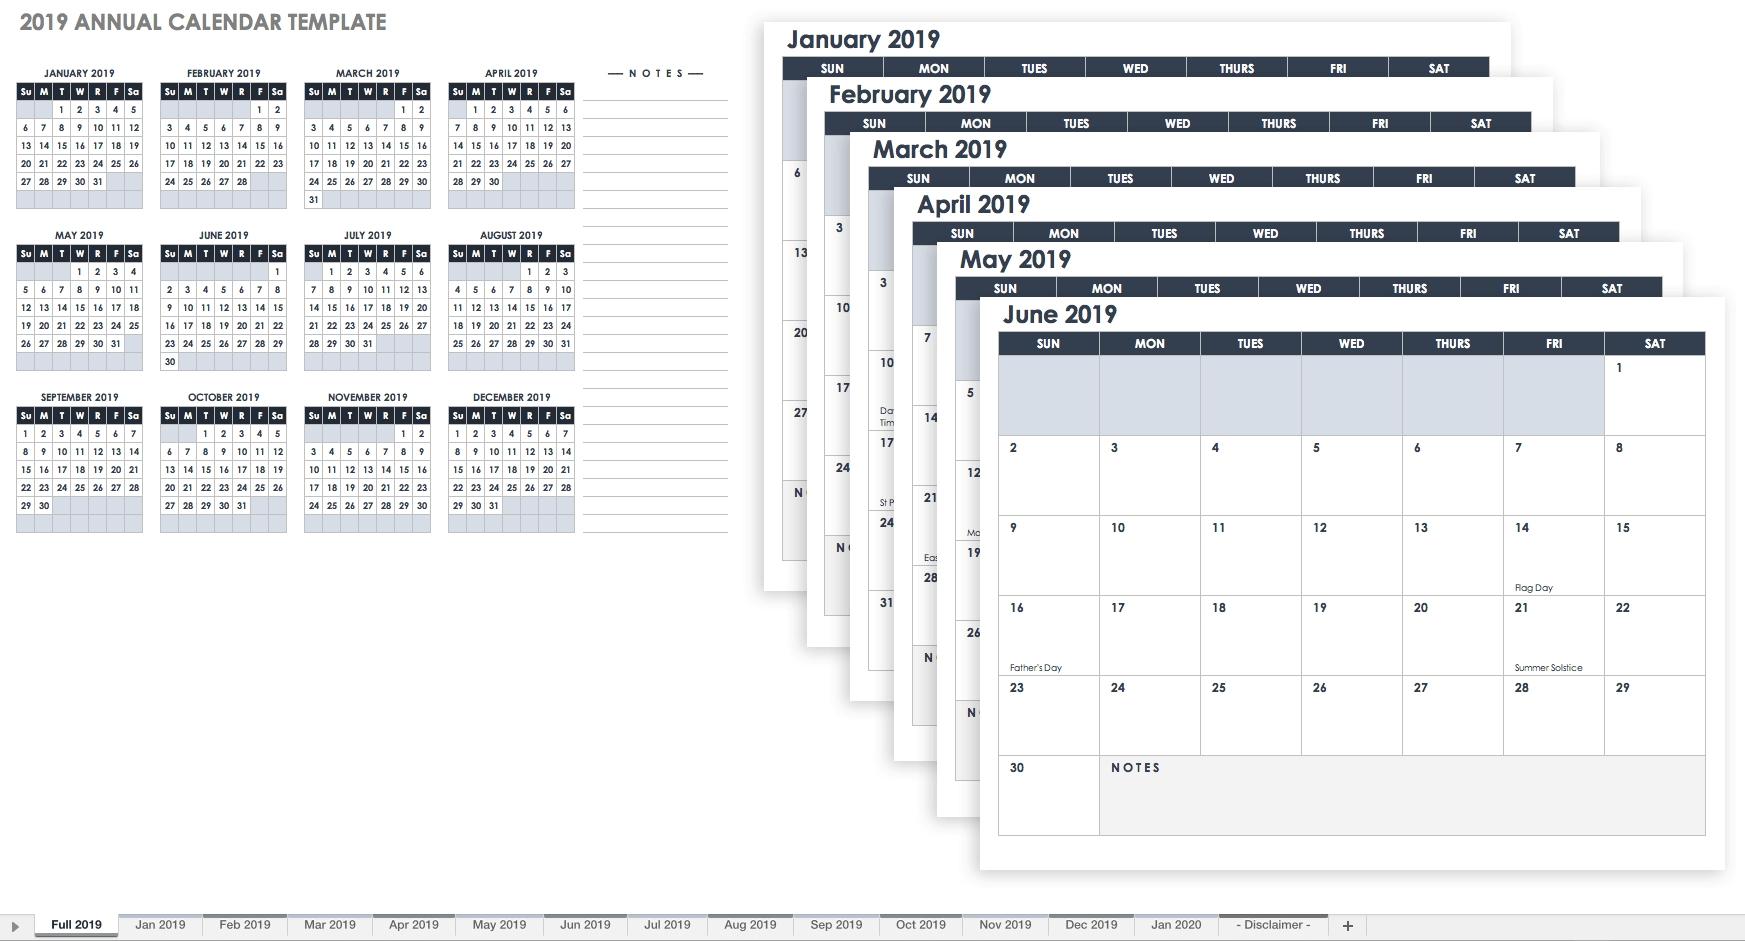 Free Printable 2020 Employee Attendance Calendar - Peri.con-Free Employee Attendance 2020 Templates